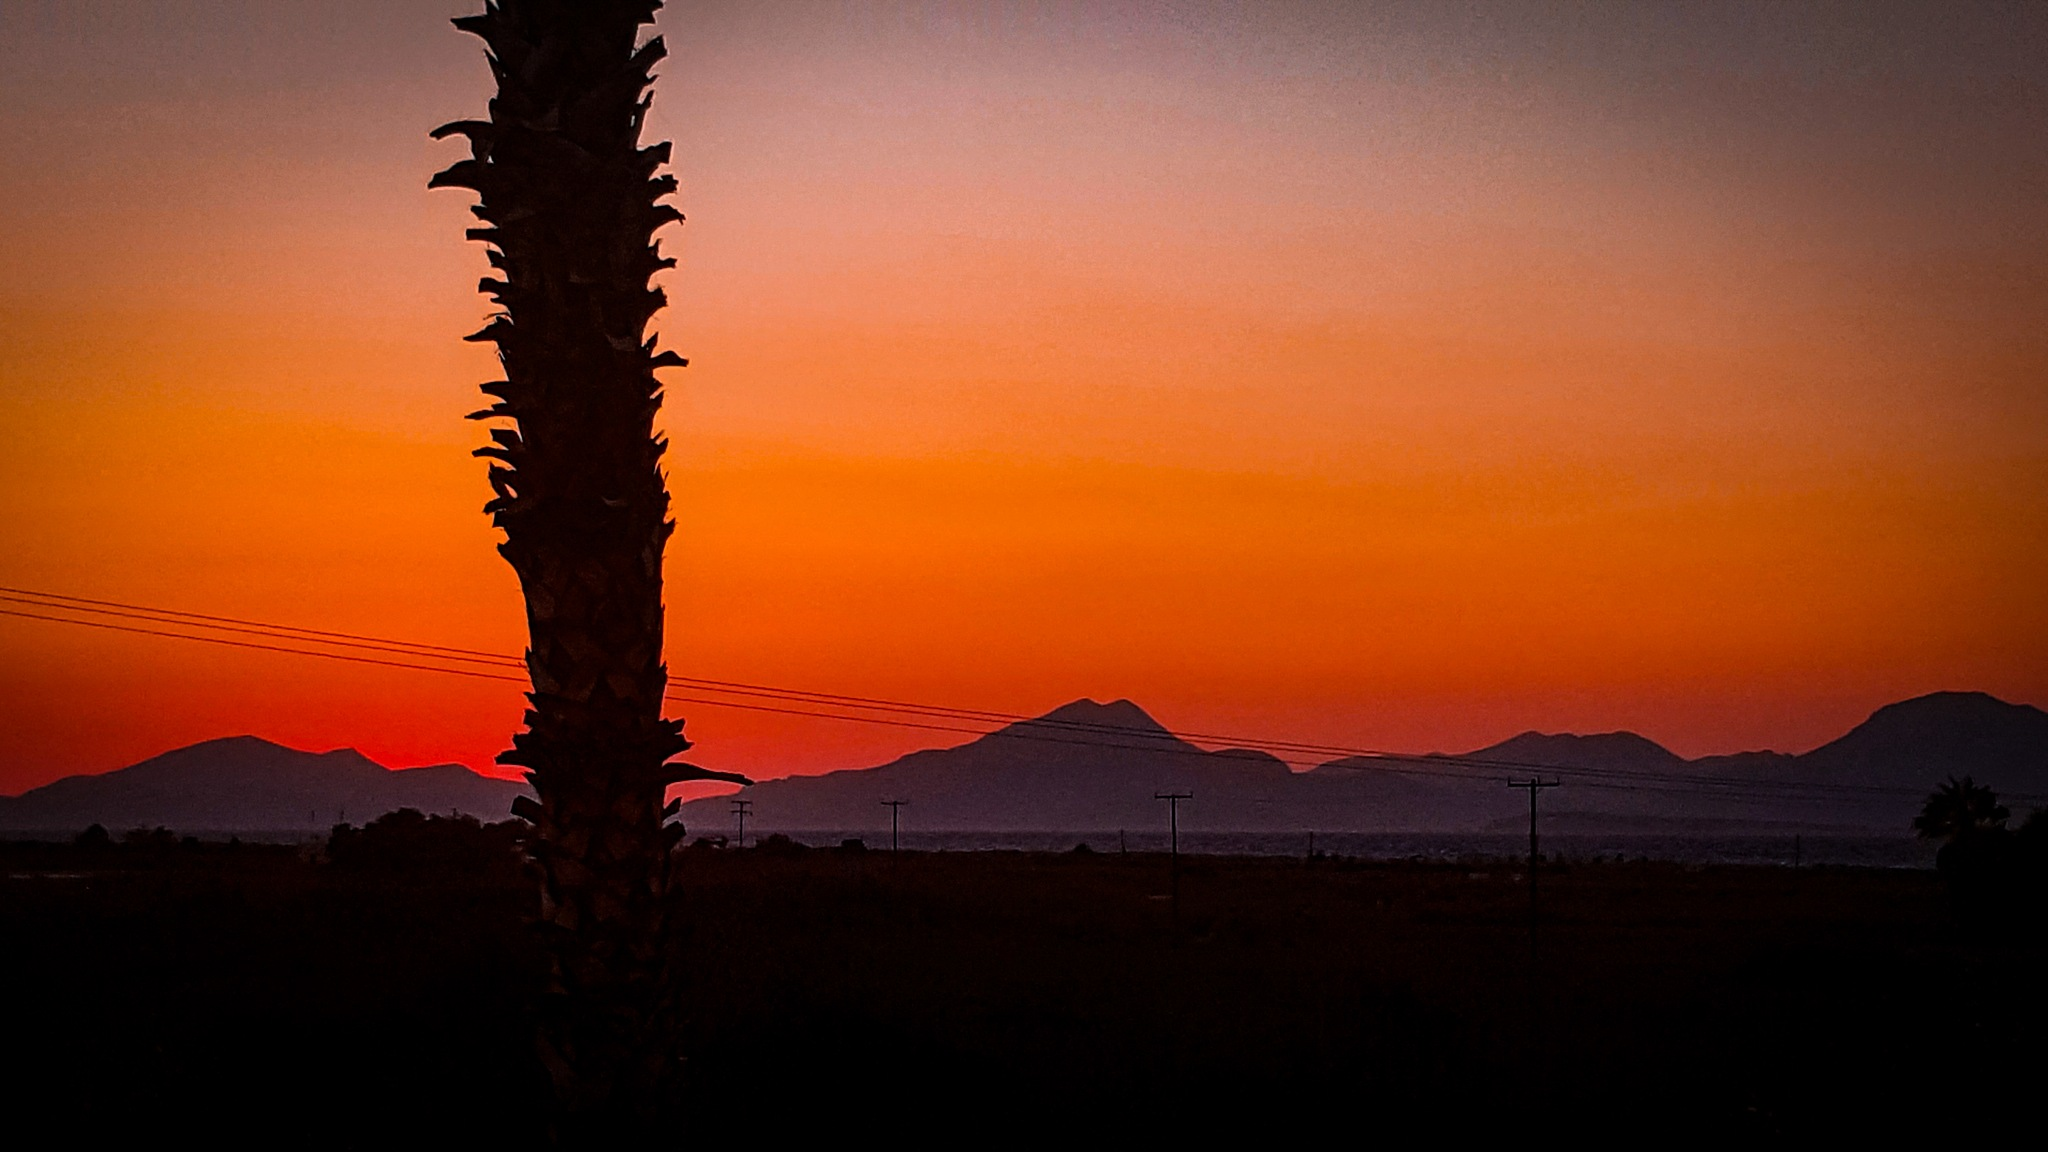 greek sunset by steve.norris.9047